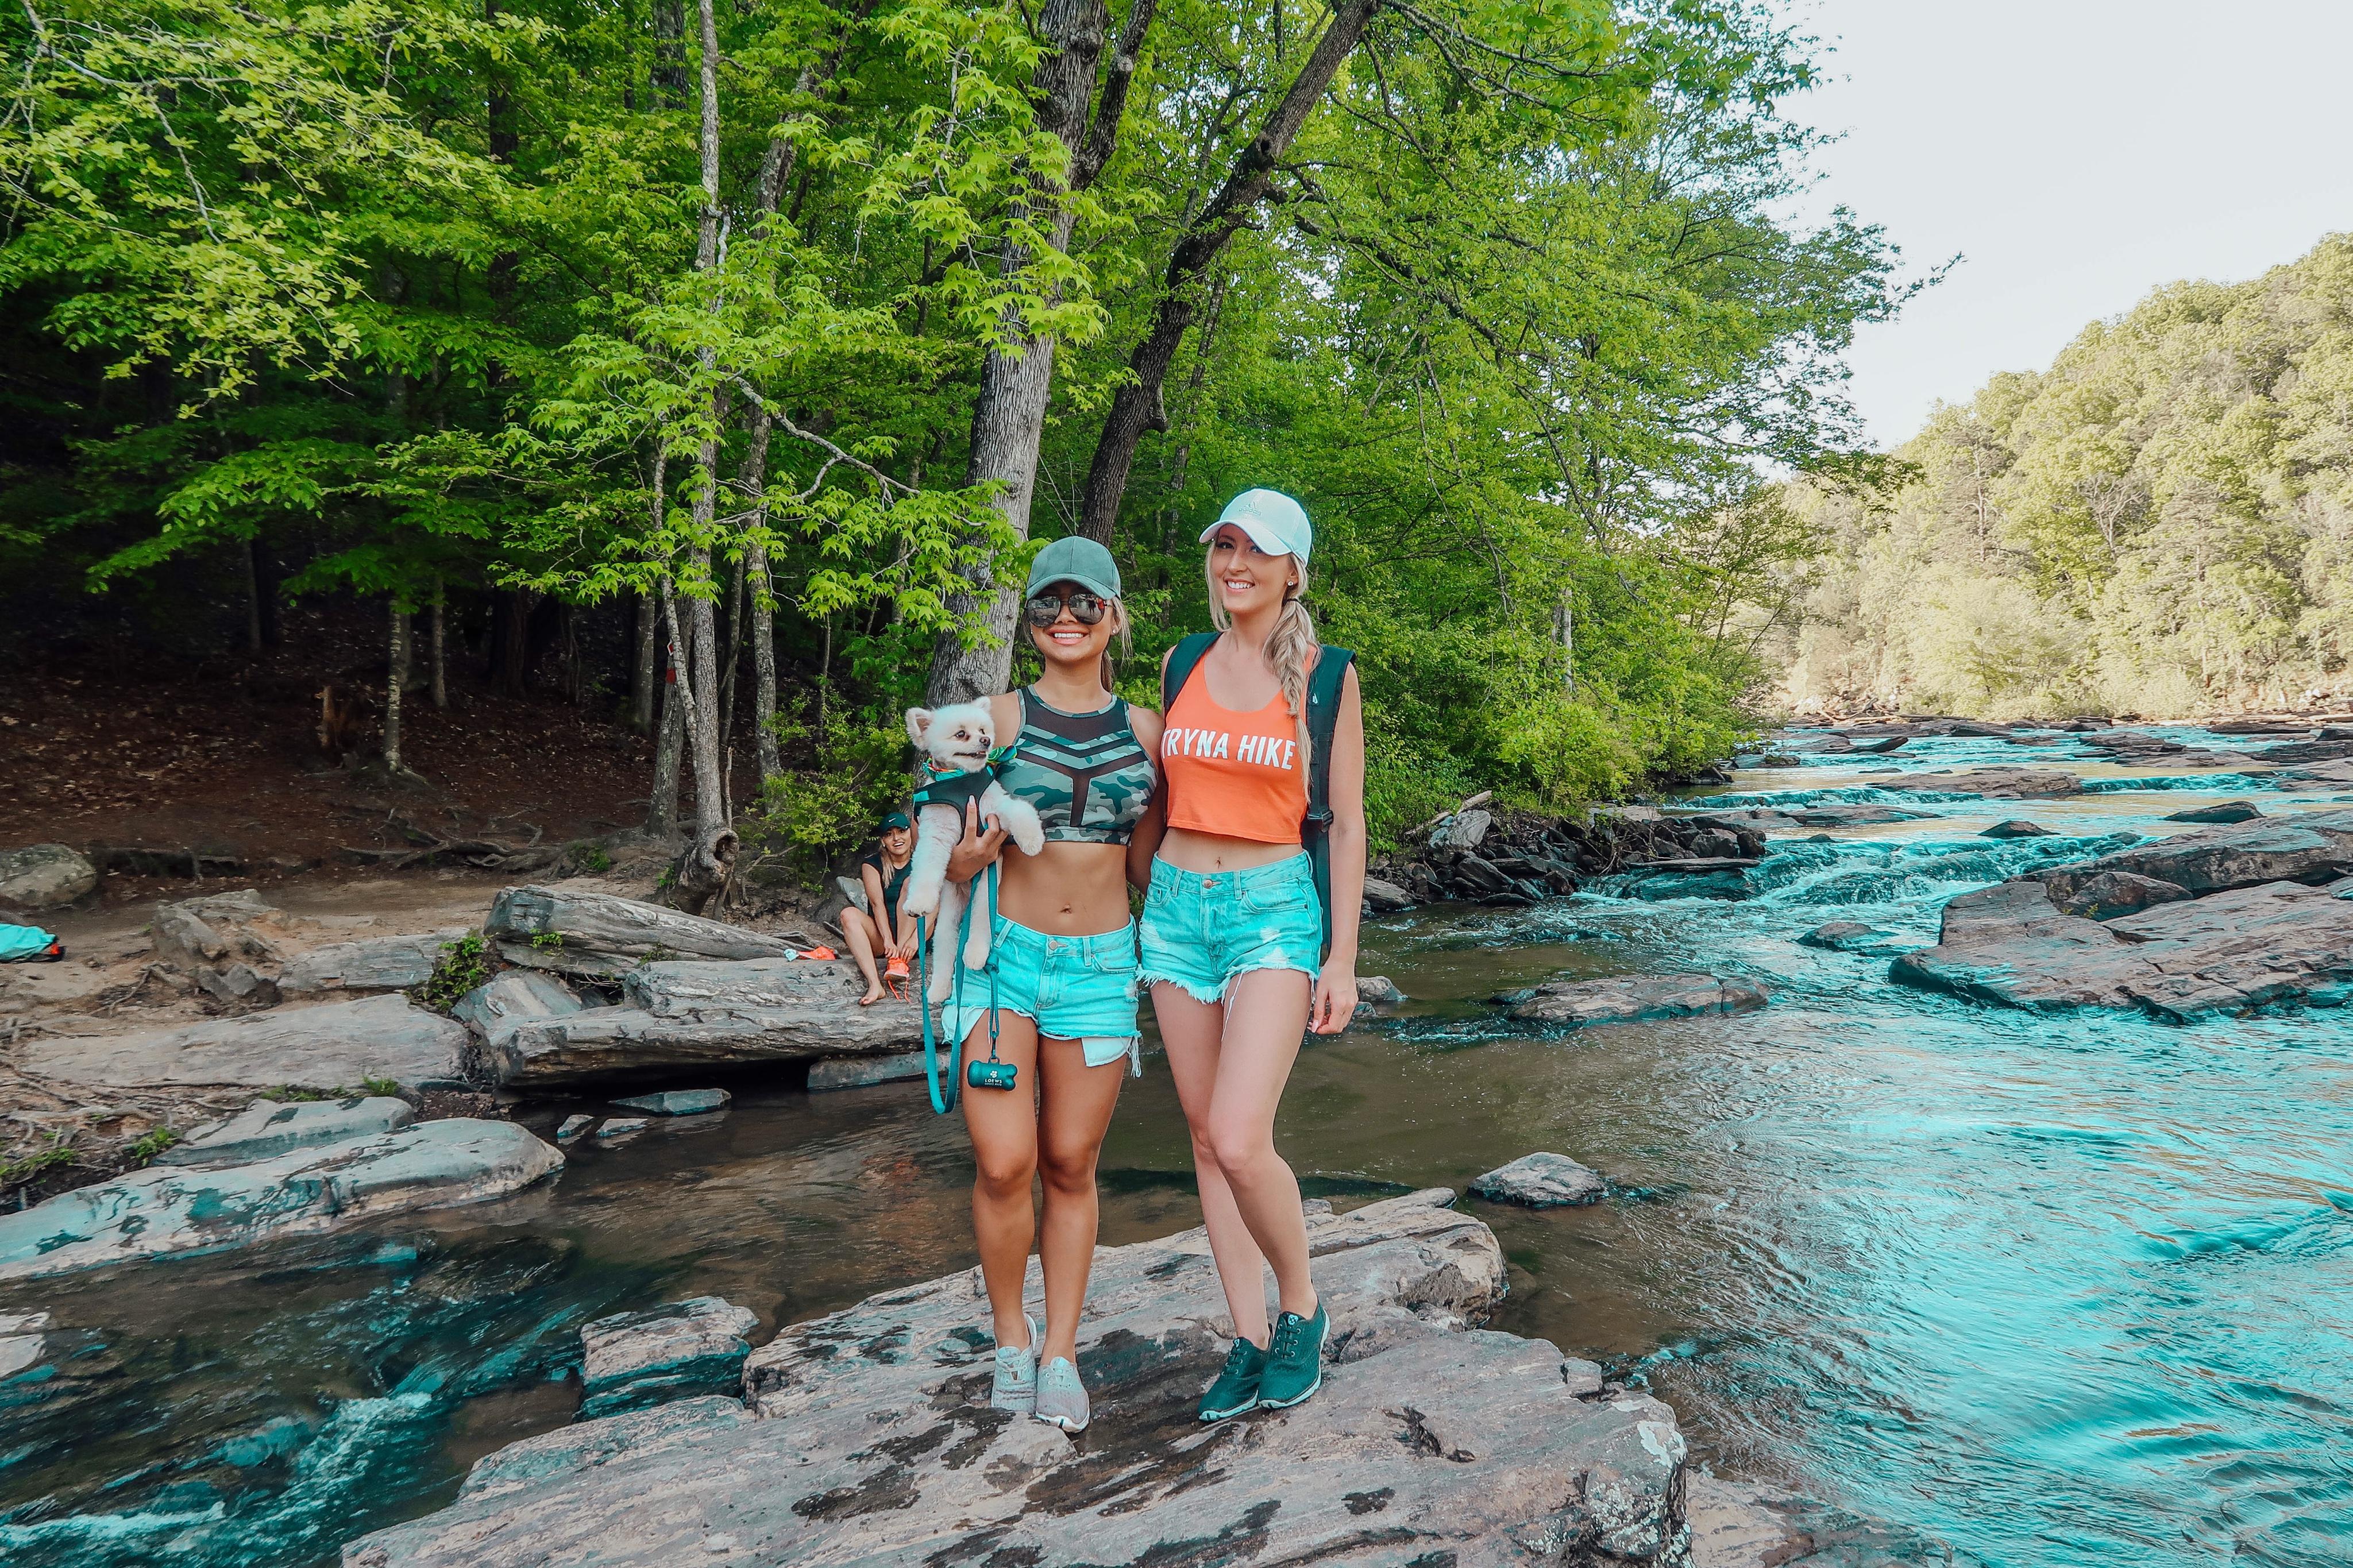 Exploring Sweetwater Creek